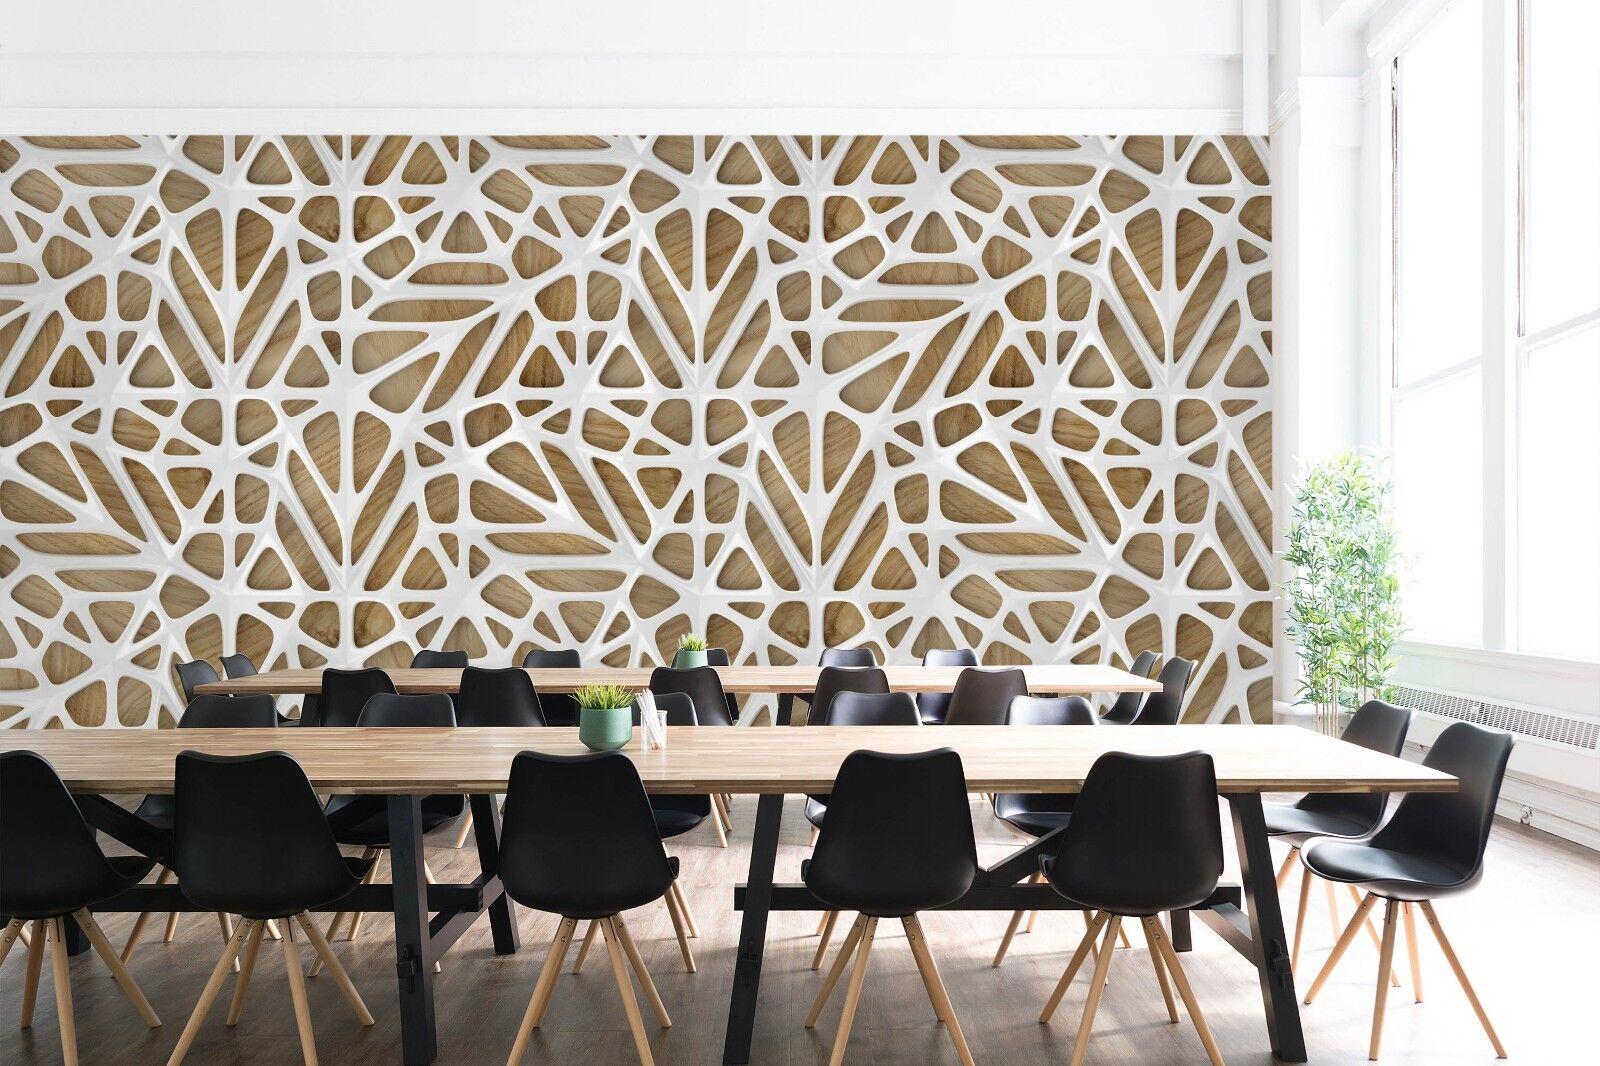 3D Hohl whitees Holz 2 Textur Fliesen Marmor Tapeten Abziehbild Tapete Wandbild